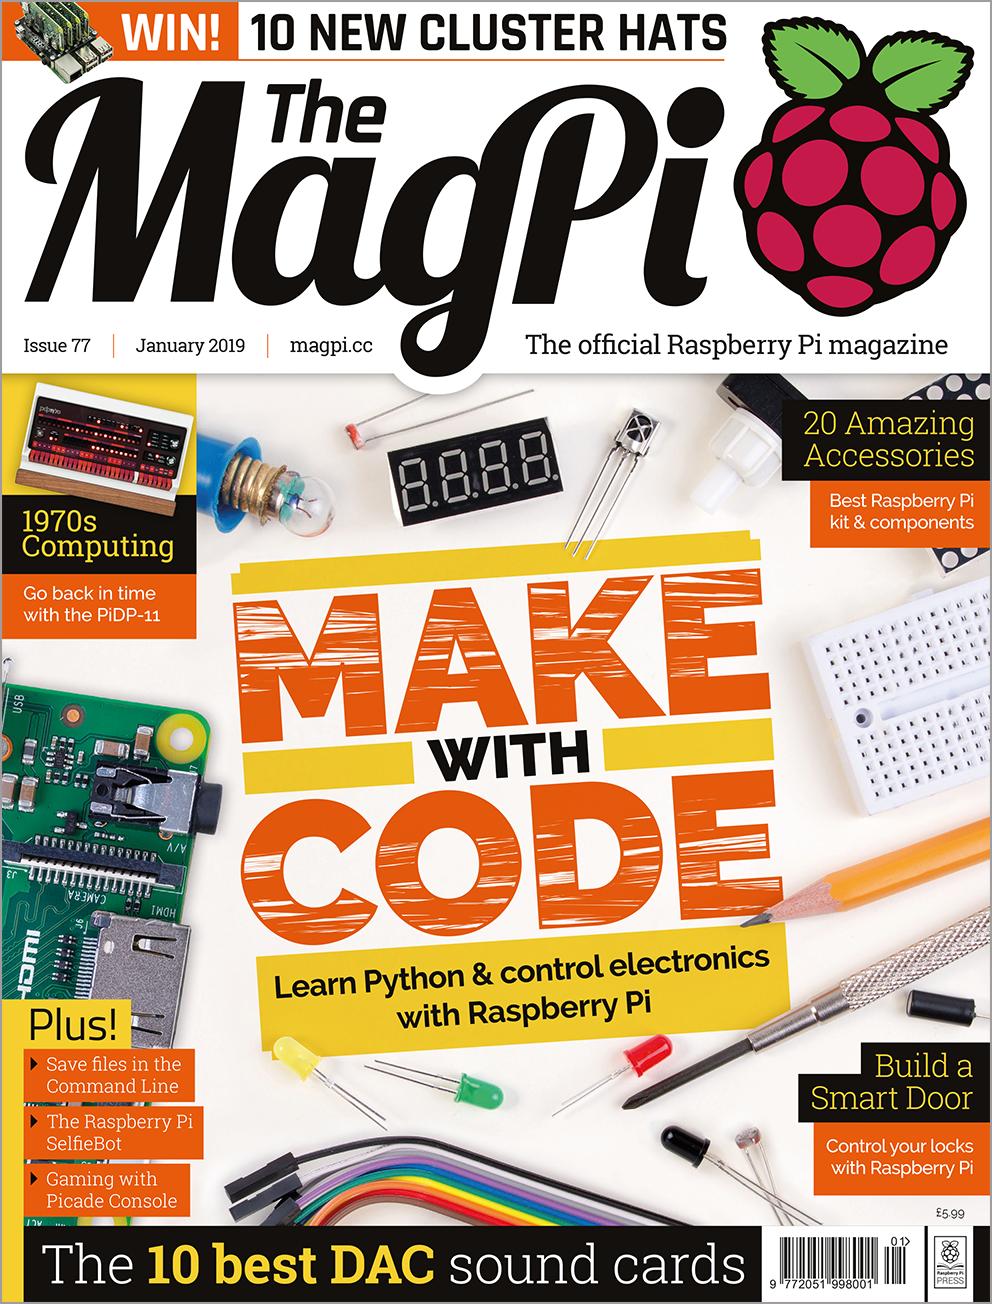 Issue 77 — The MagPi magazine